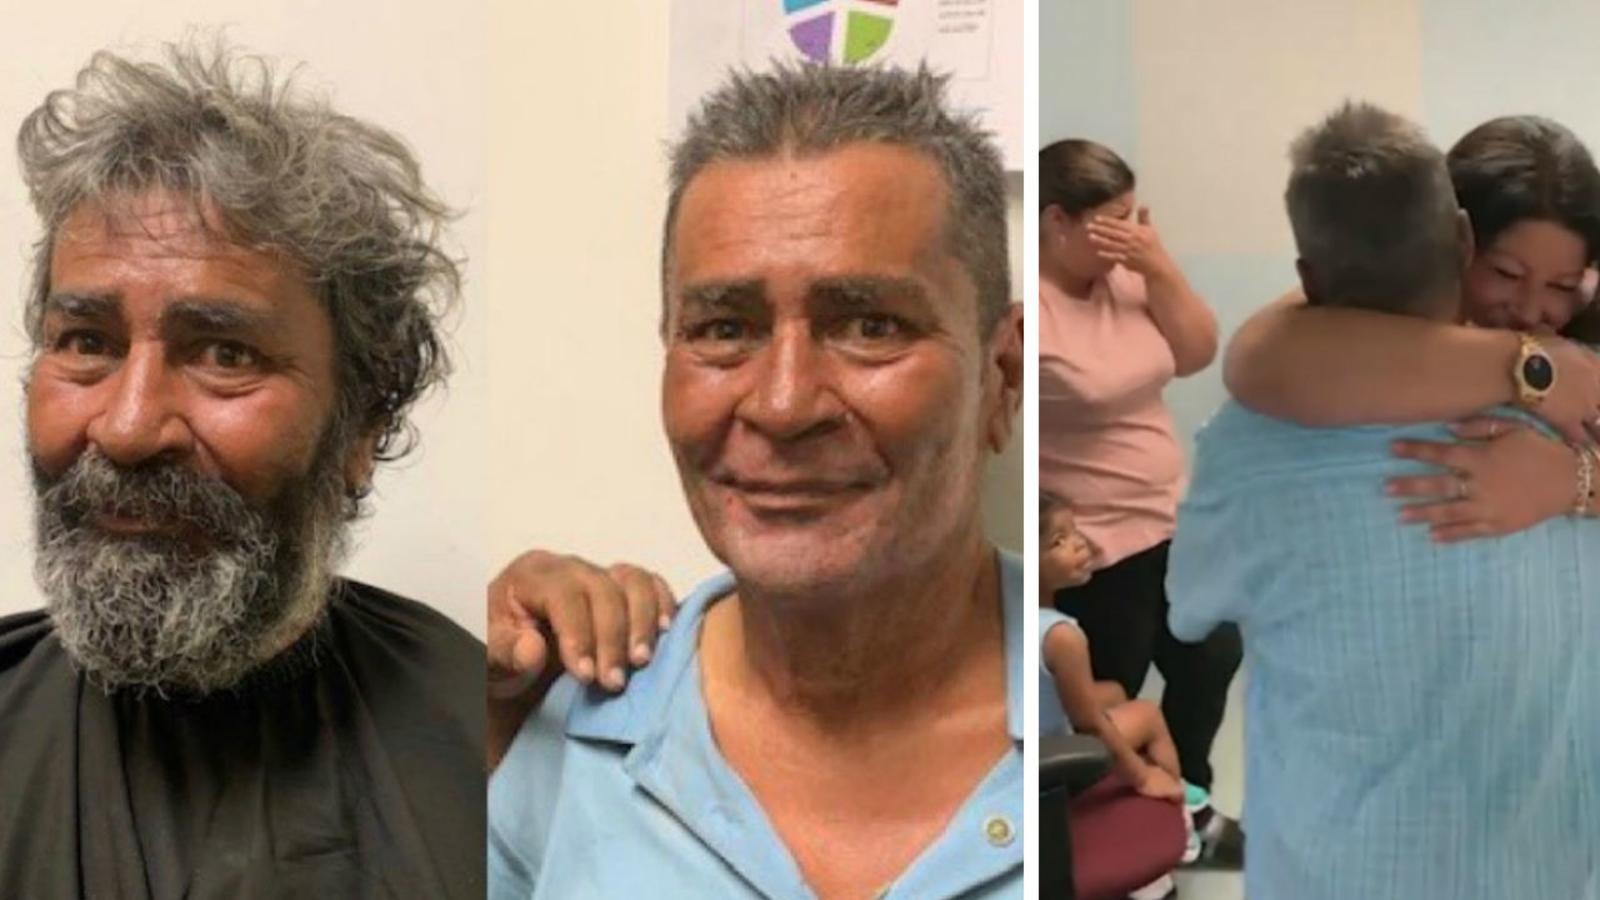 Tears of joy: NJ Transit reunites homeless man with daughter, granddaughters